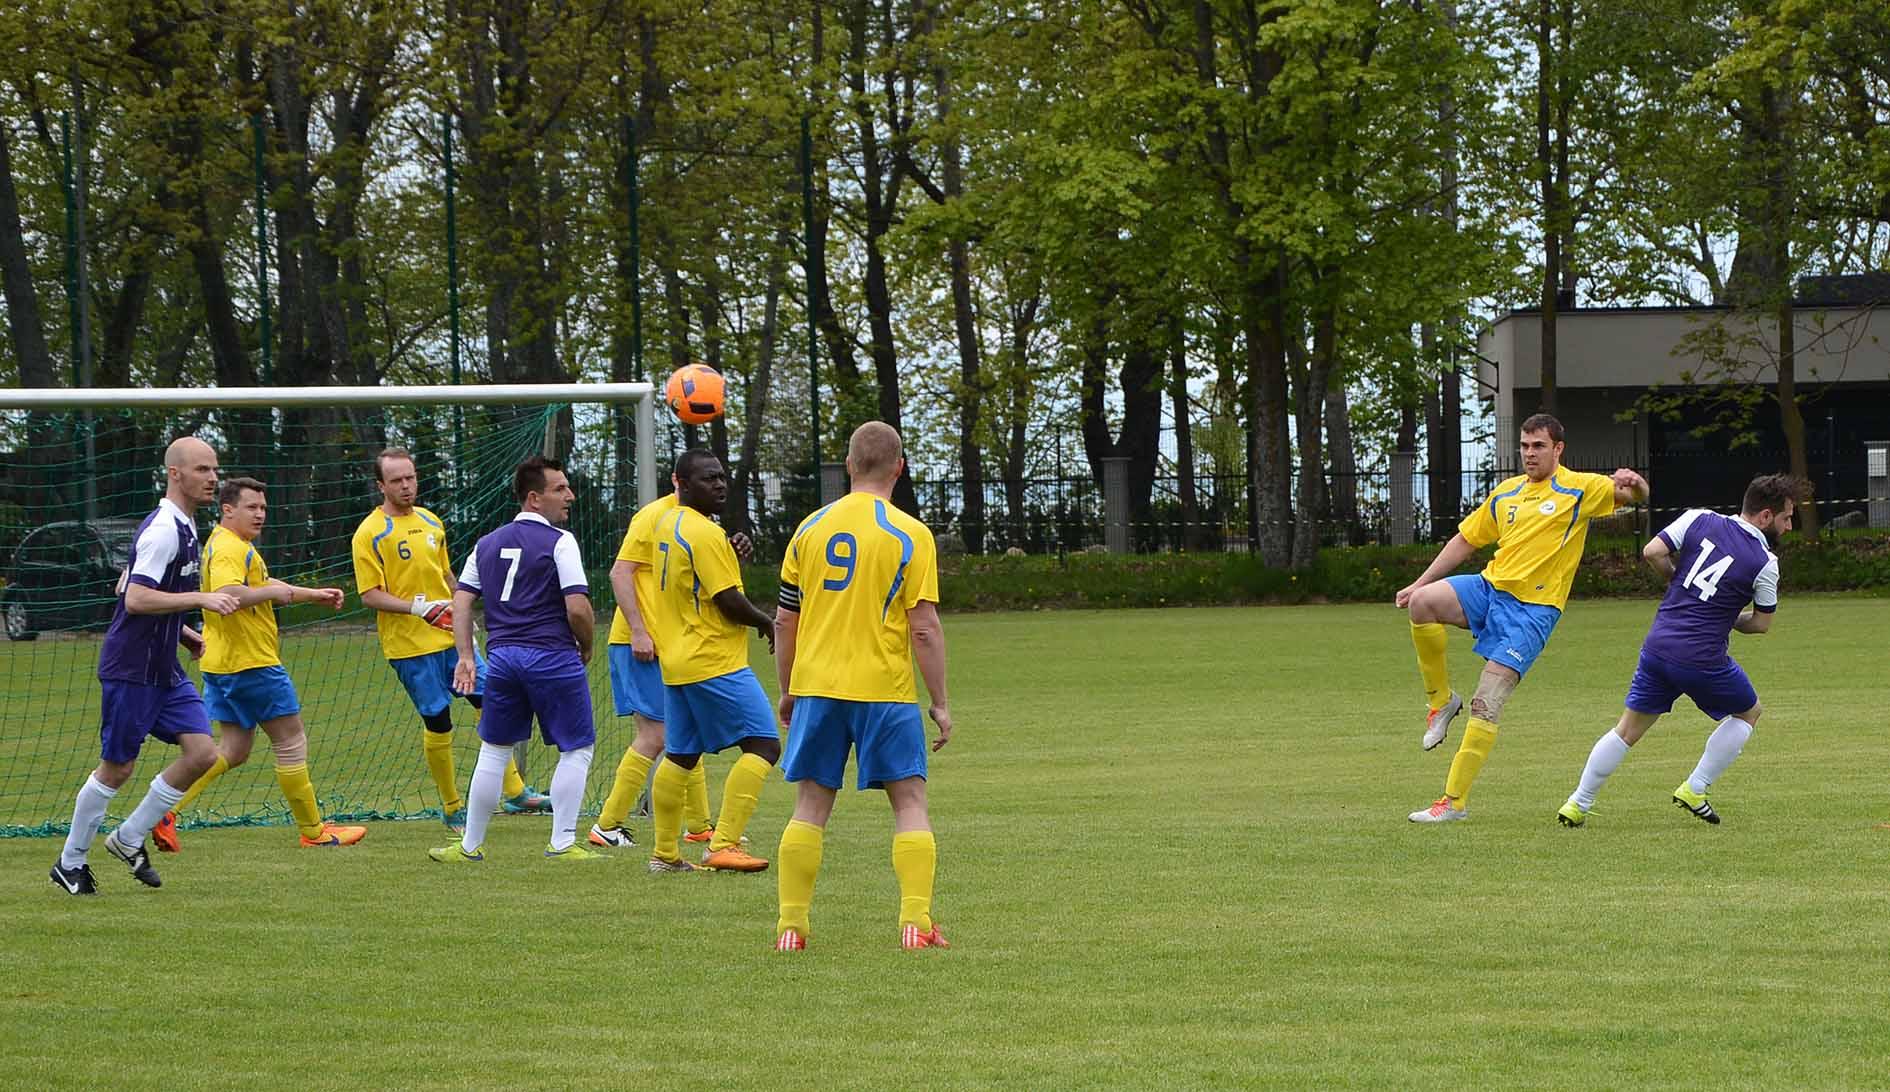 2017.05.27 Football tournament (6)